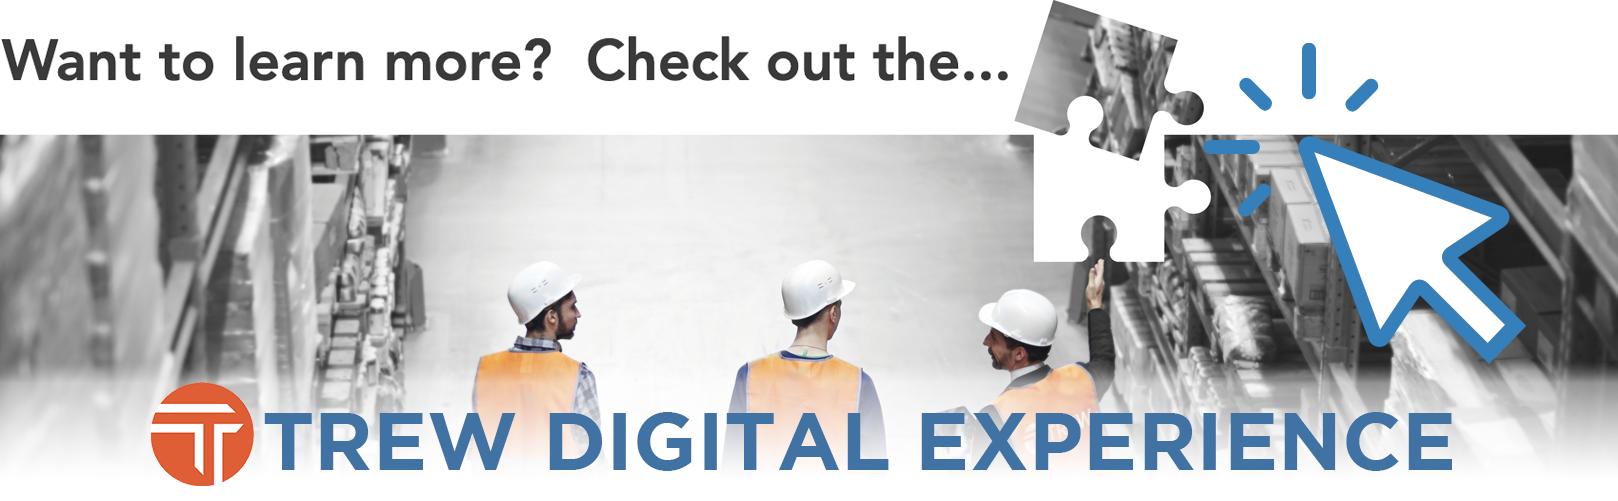 TREW Digital Experience